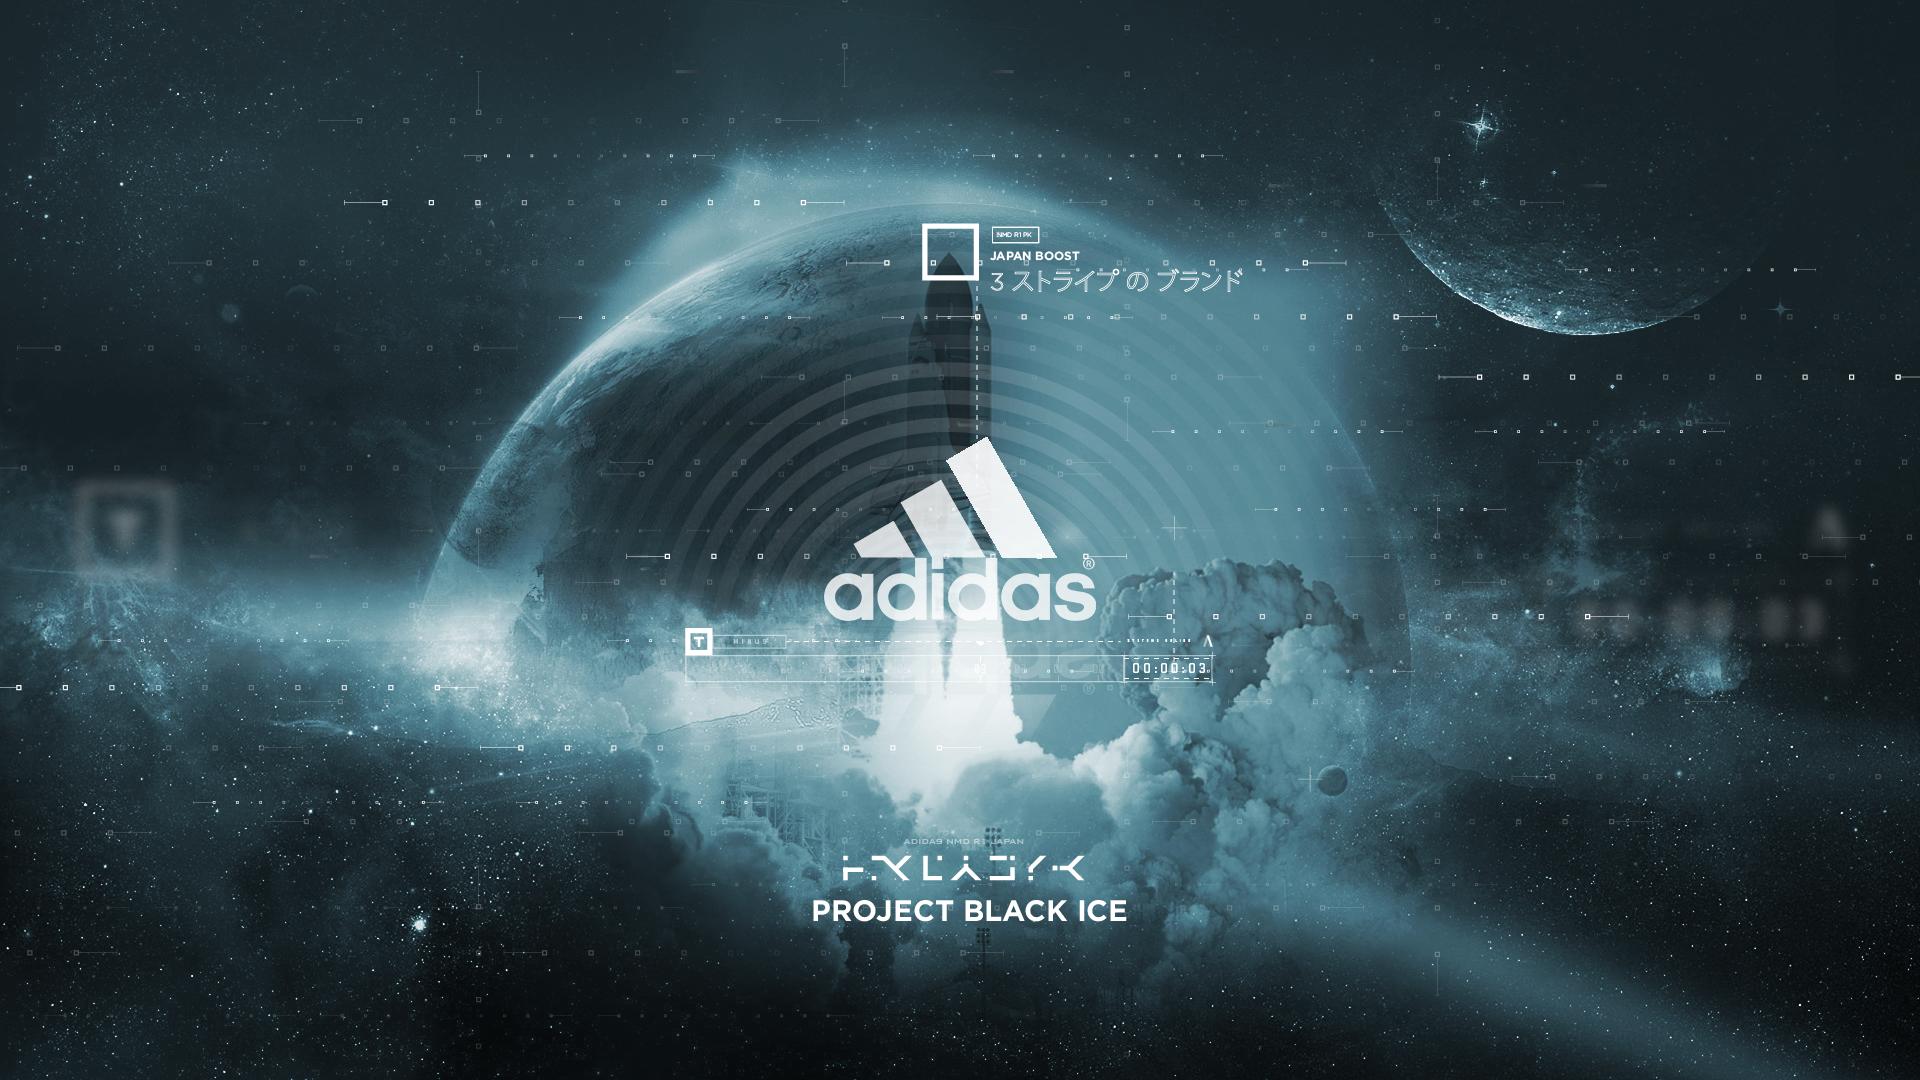 Adidas_Concept_v006-01.png